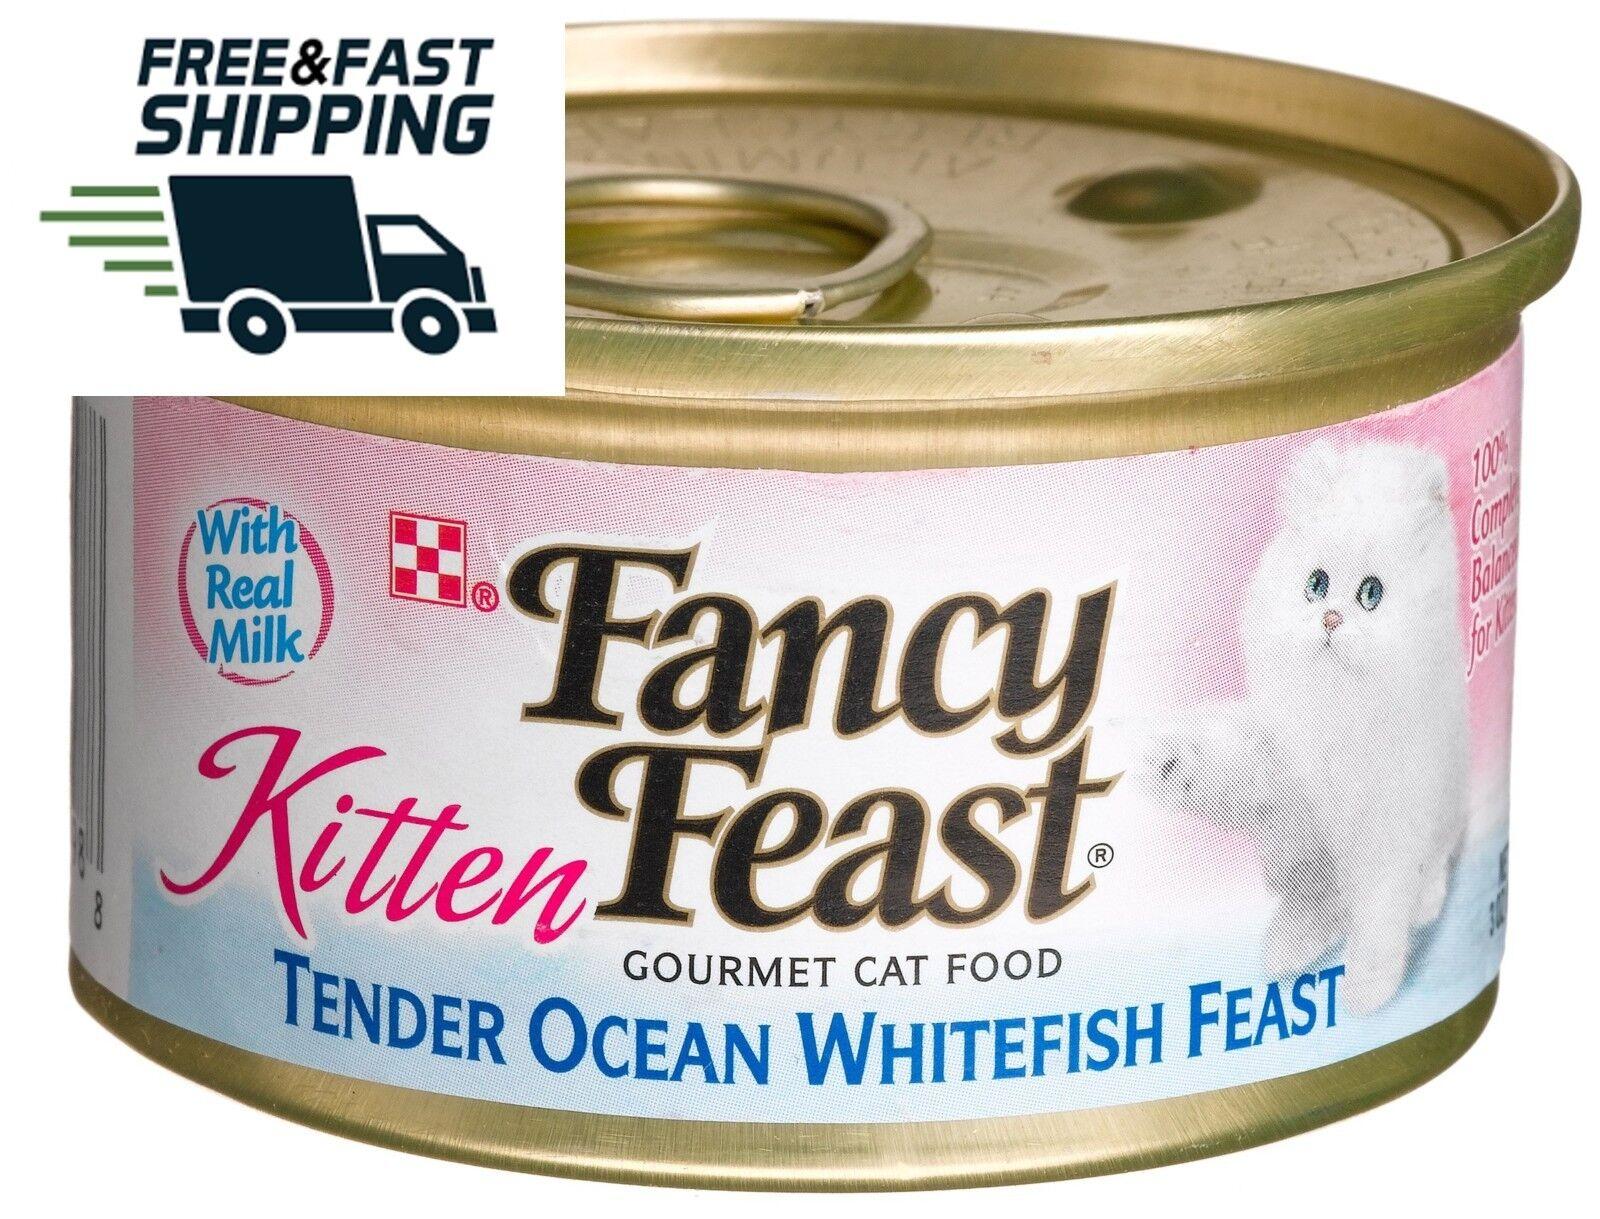 Fancy Feast Tender Ocean Whitefish Feast Gourmet Canned Kitt